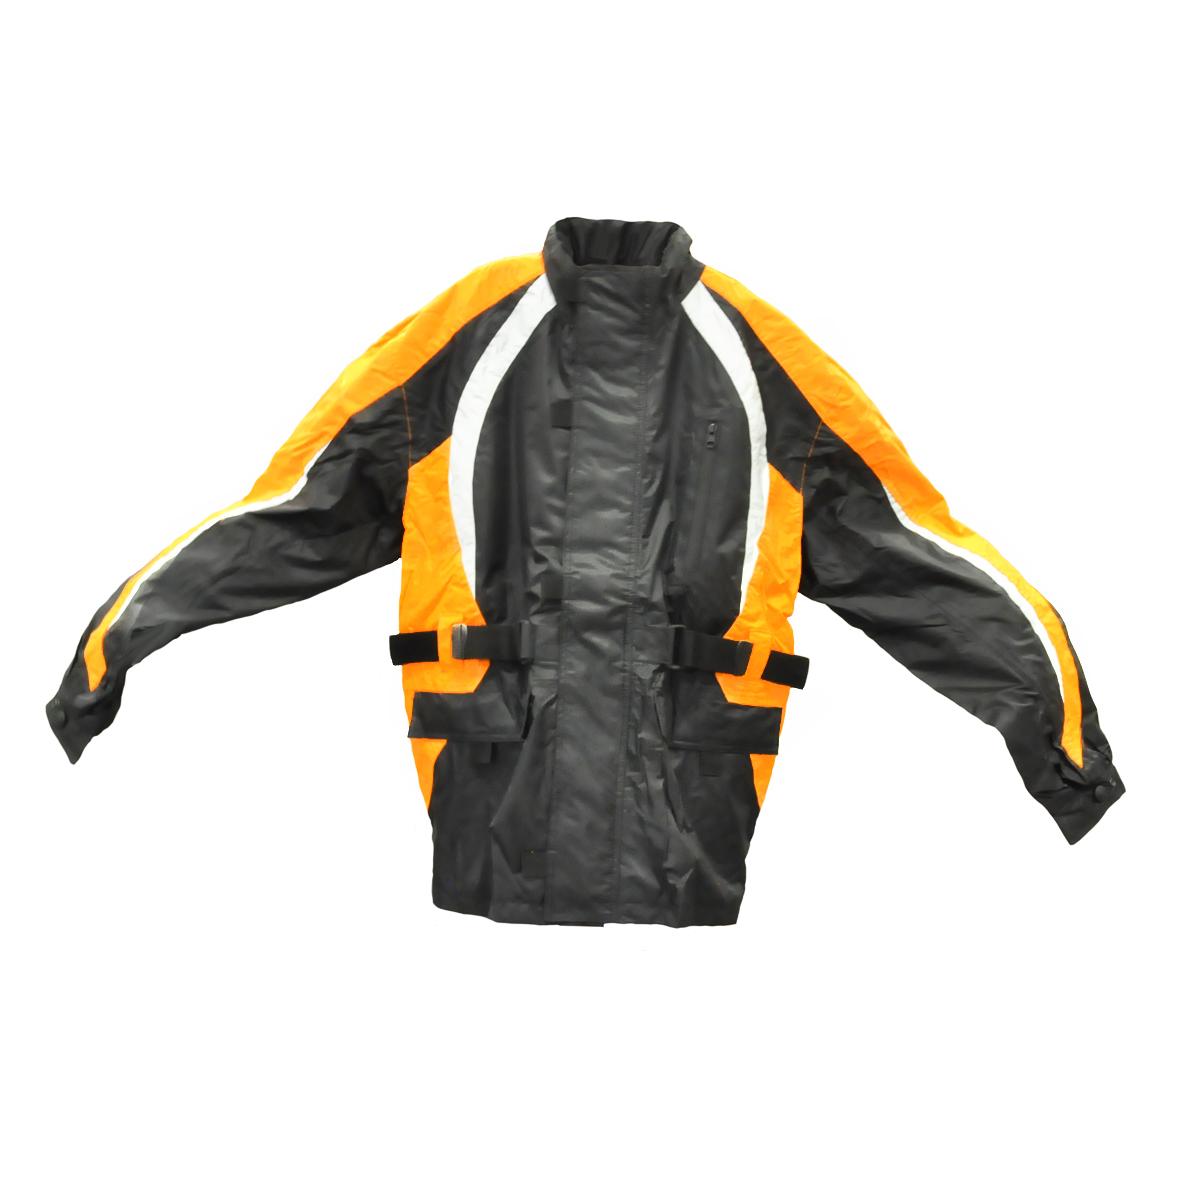 Fulmer, TRS2ORGM, Men's TRS2 StormTrak Rain Suit Motorcycle Rain Jacket, Pants & Carry Bag - Orange, M